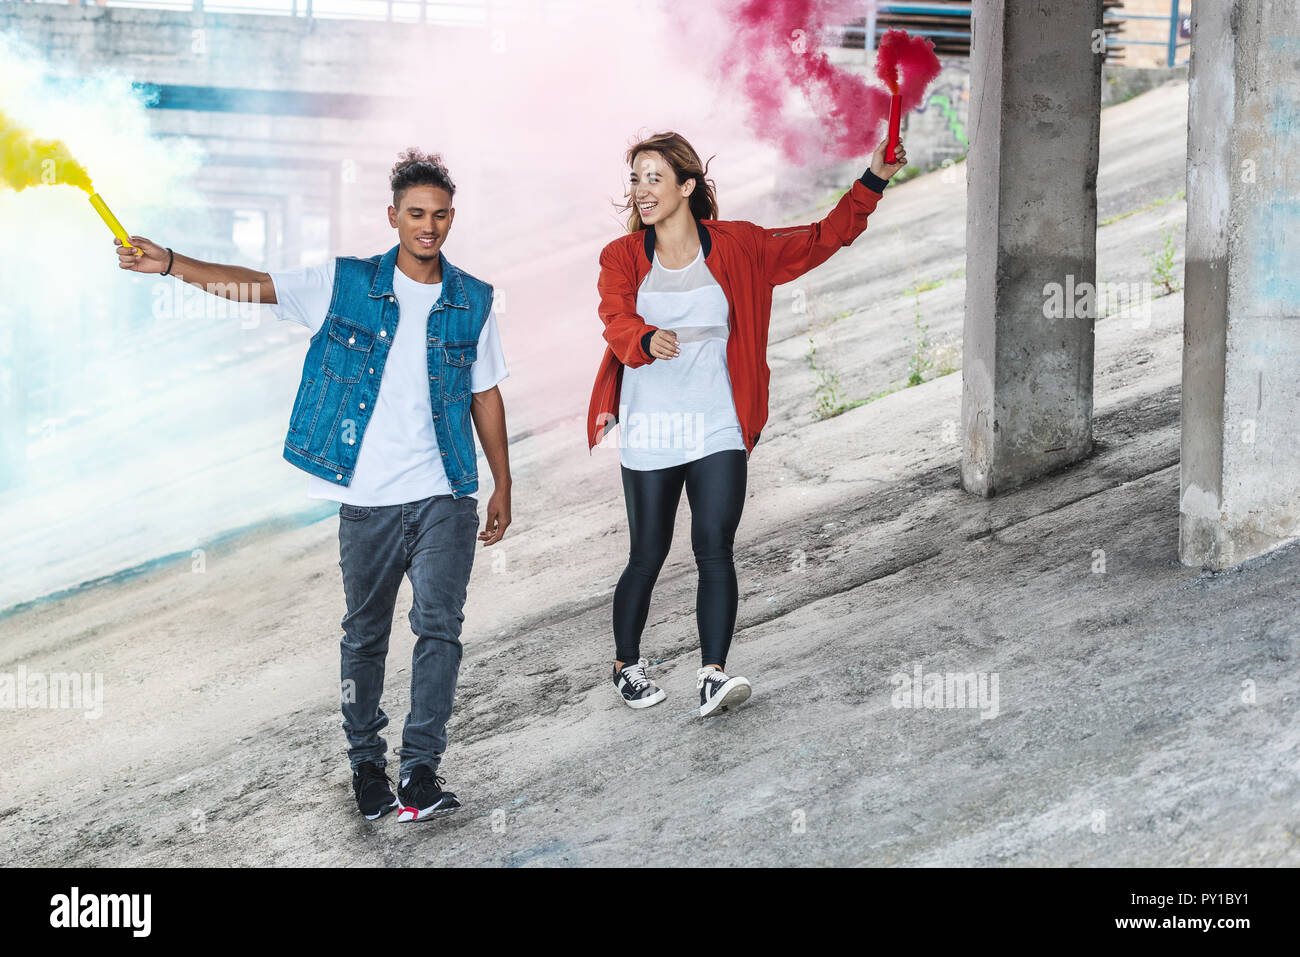 smiling stylish couple holding colorful smoke bombs at city street - Stock Image